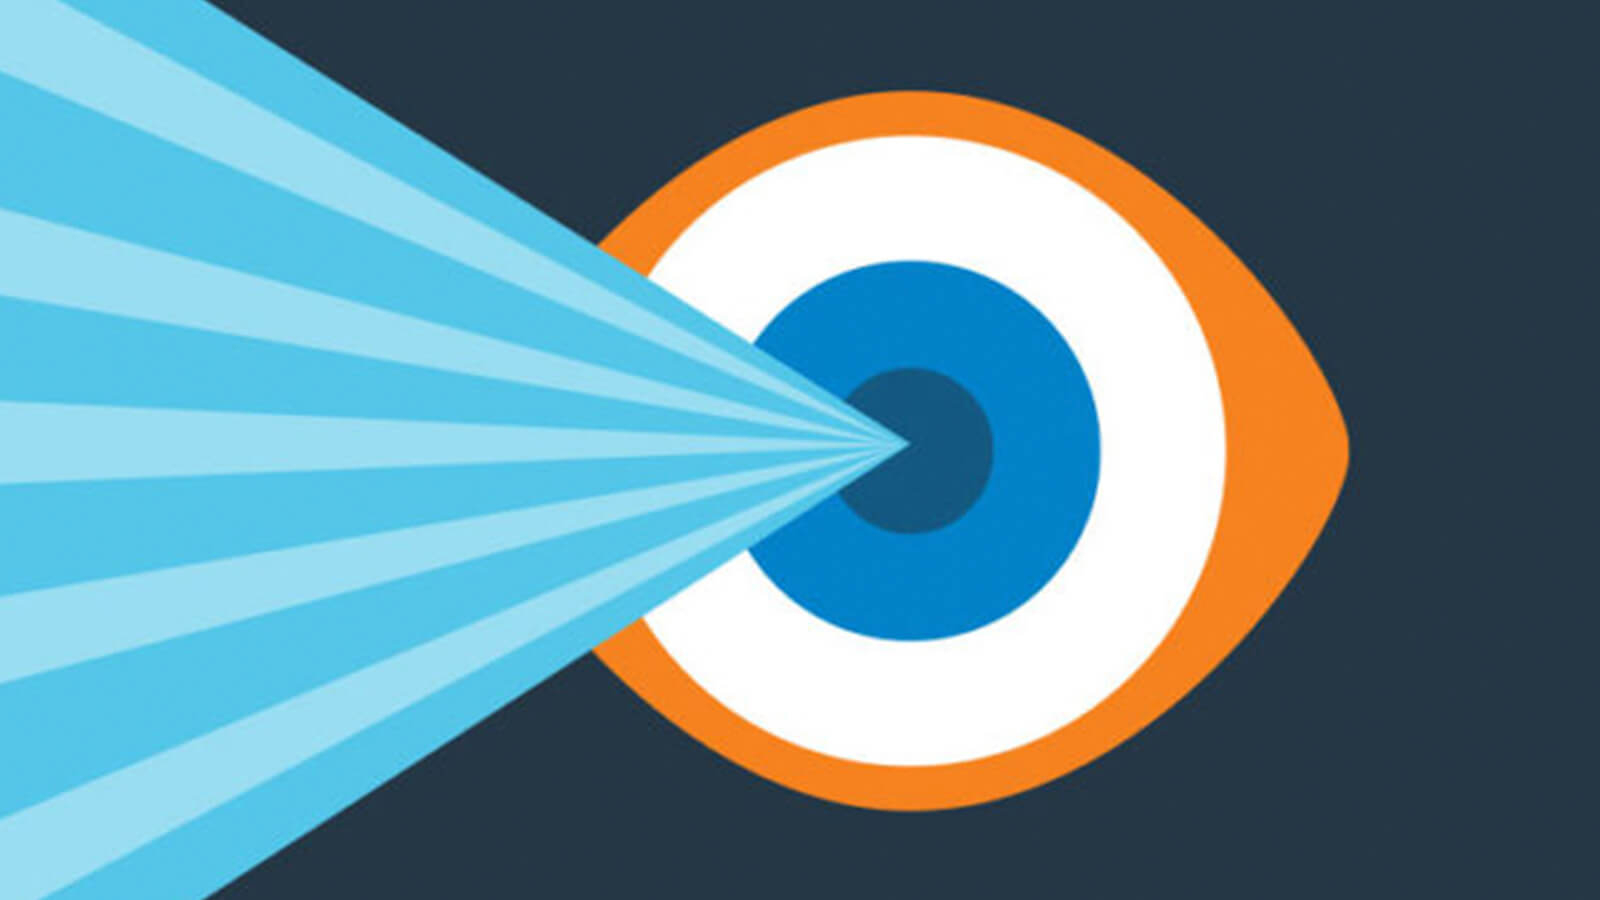 LED lights cause macular degeneration